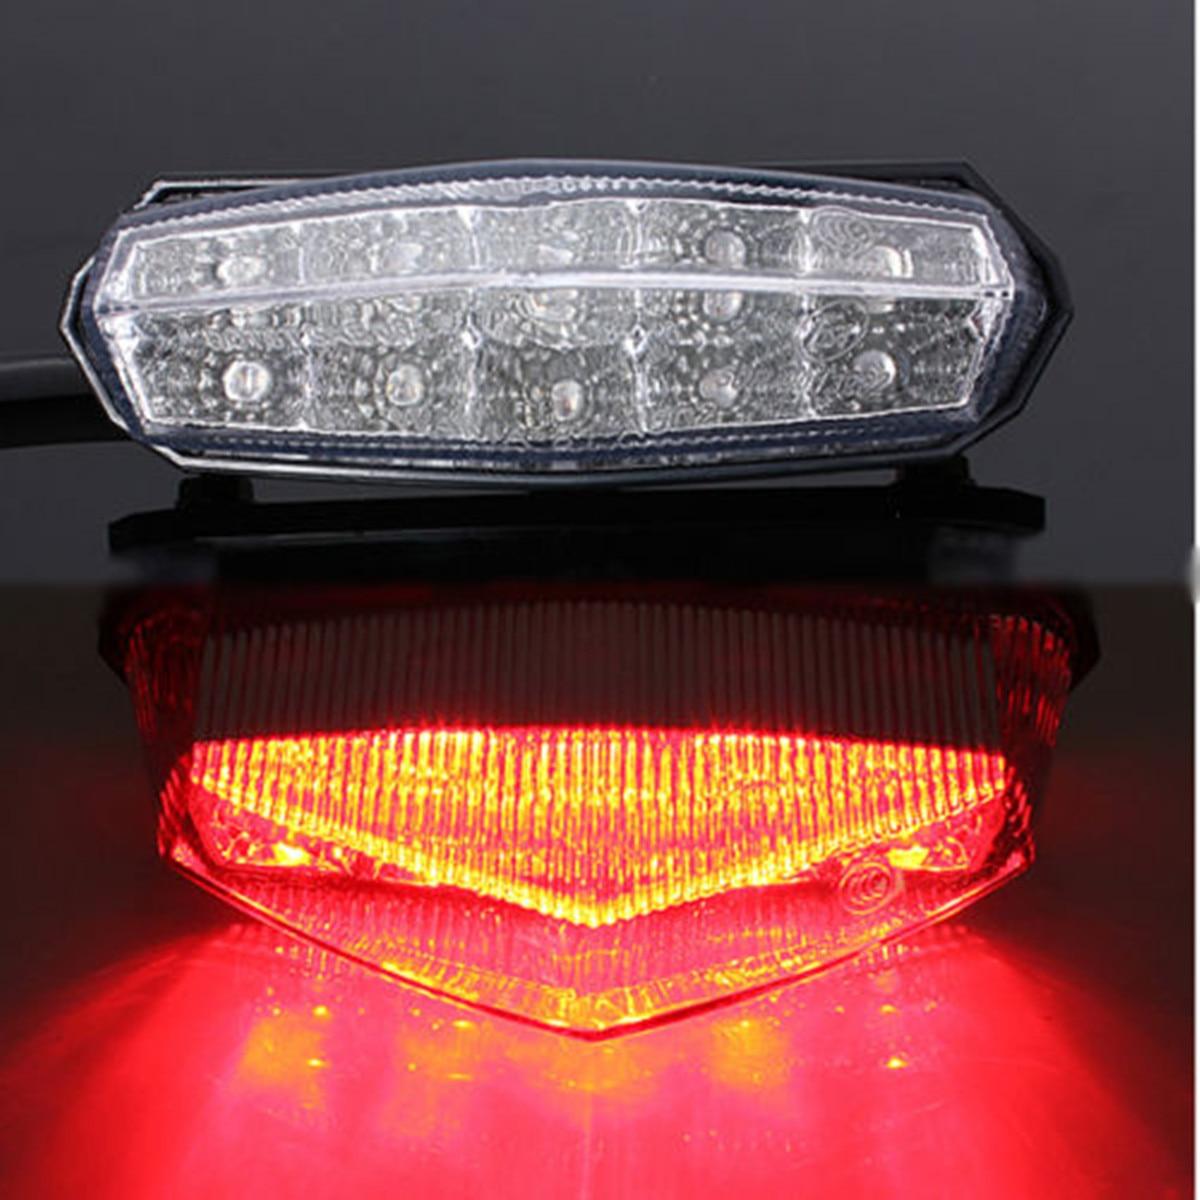 10 LED Universal Motorcycle ATV Rear Stop Tail Rear Stop Brake Light License Plate Lamp